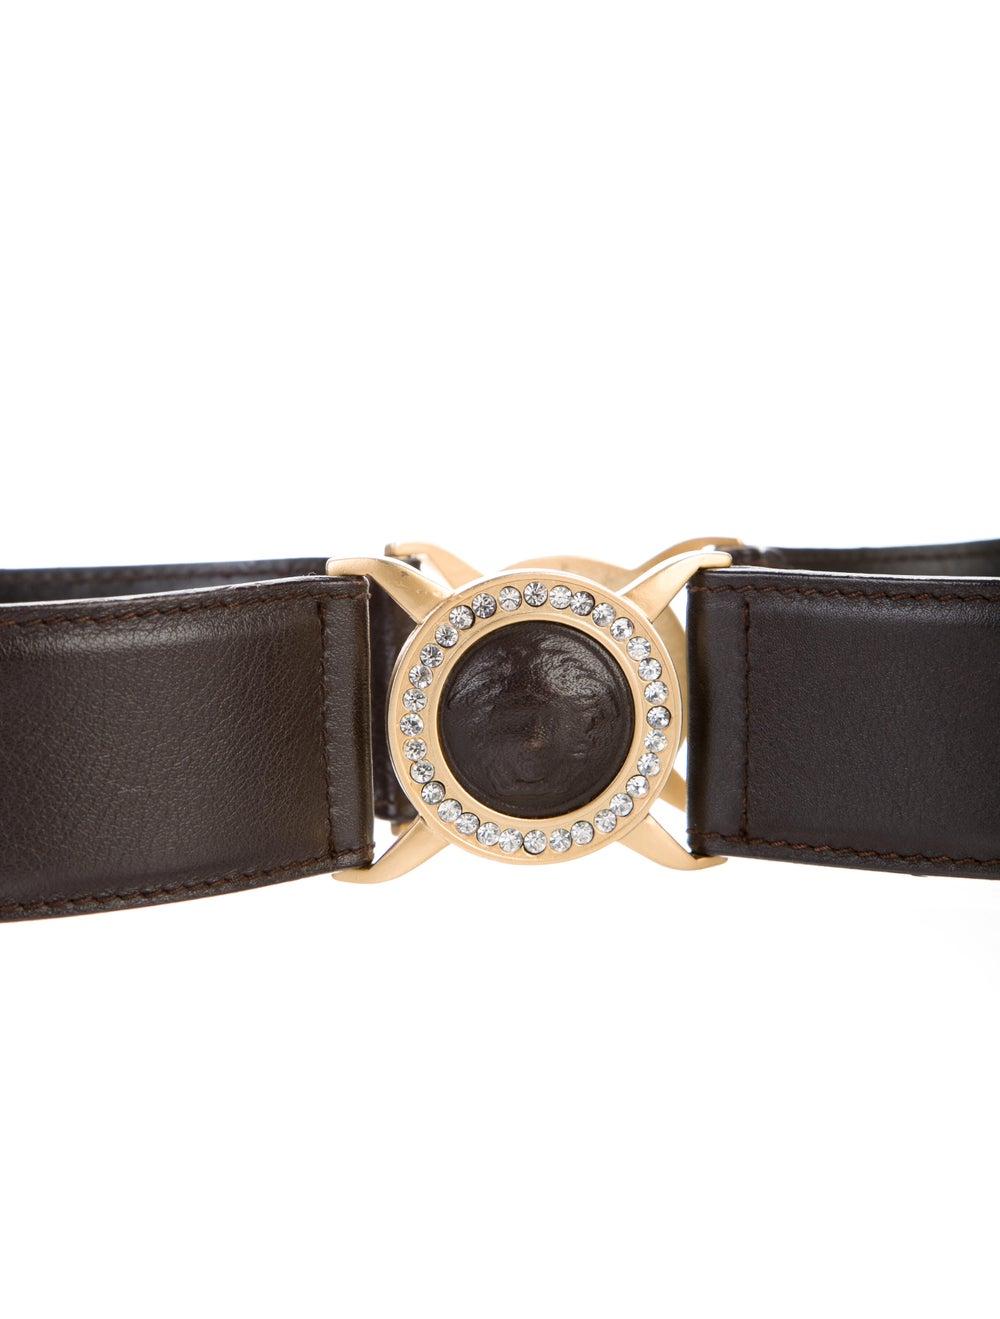 Gianni Versace Leather Crystal Embellishments Bel… - image 2